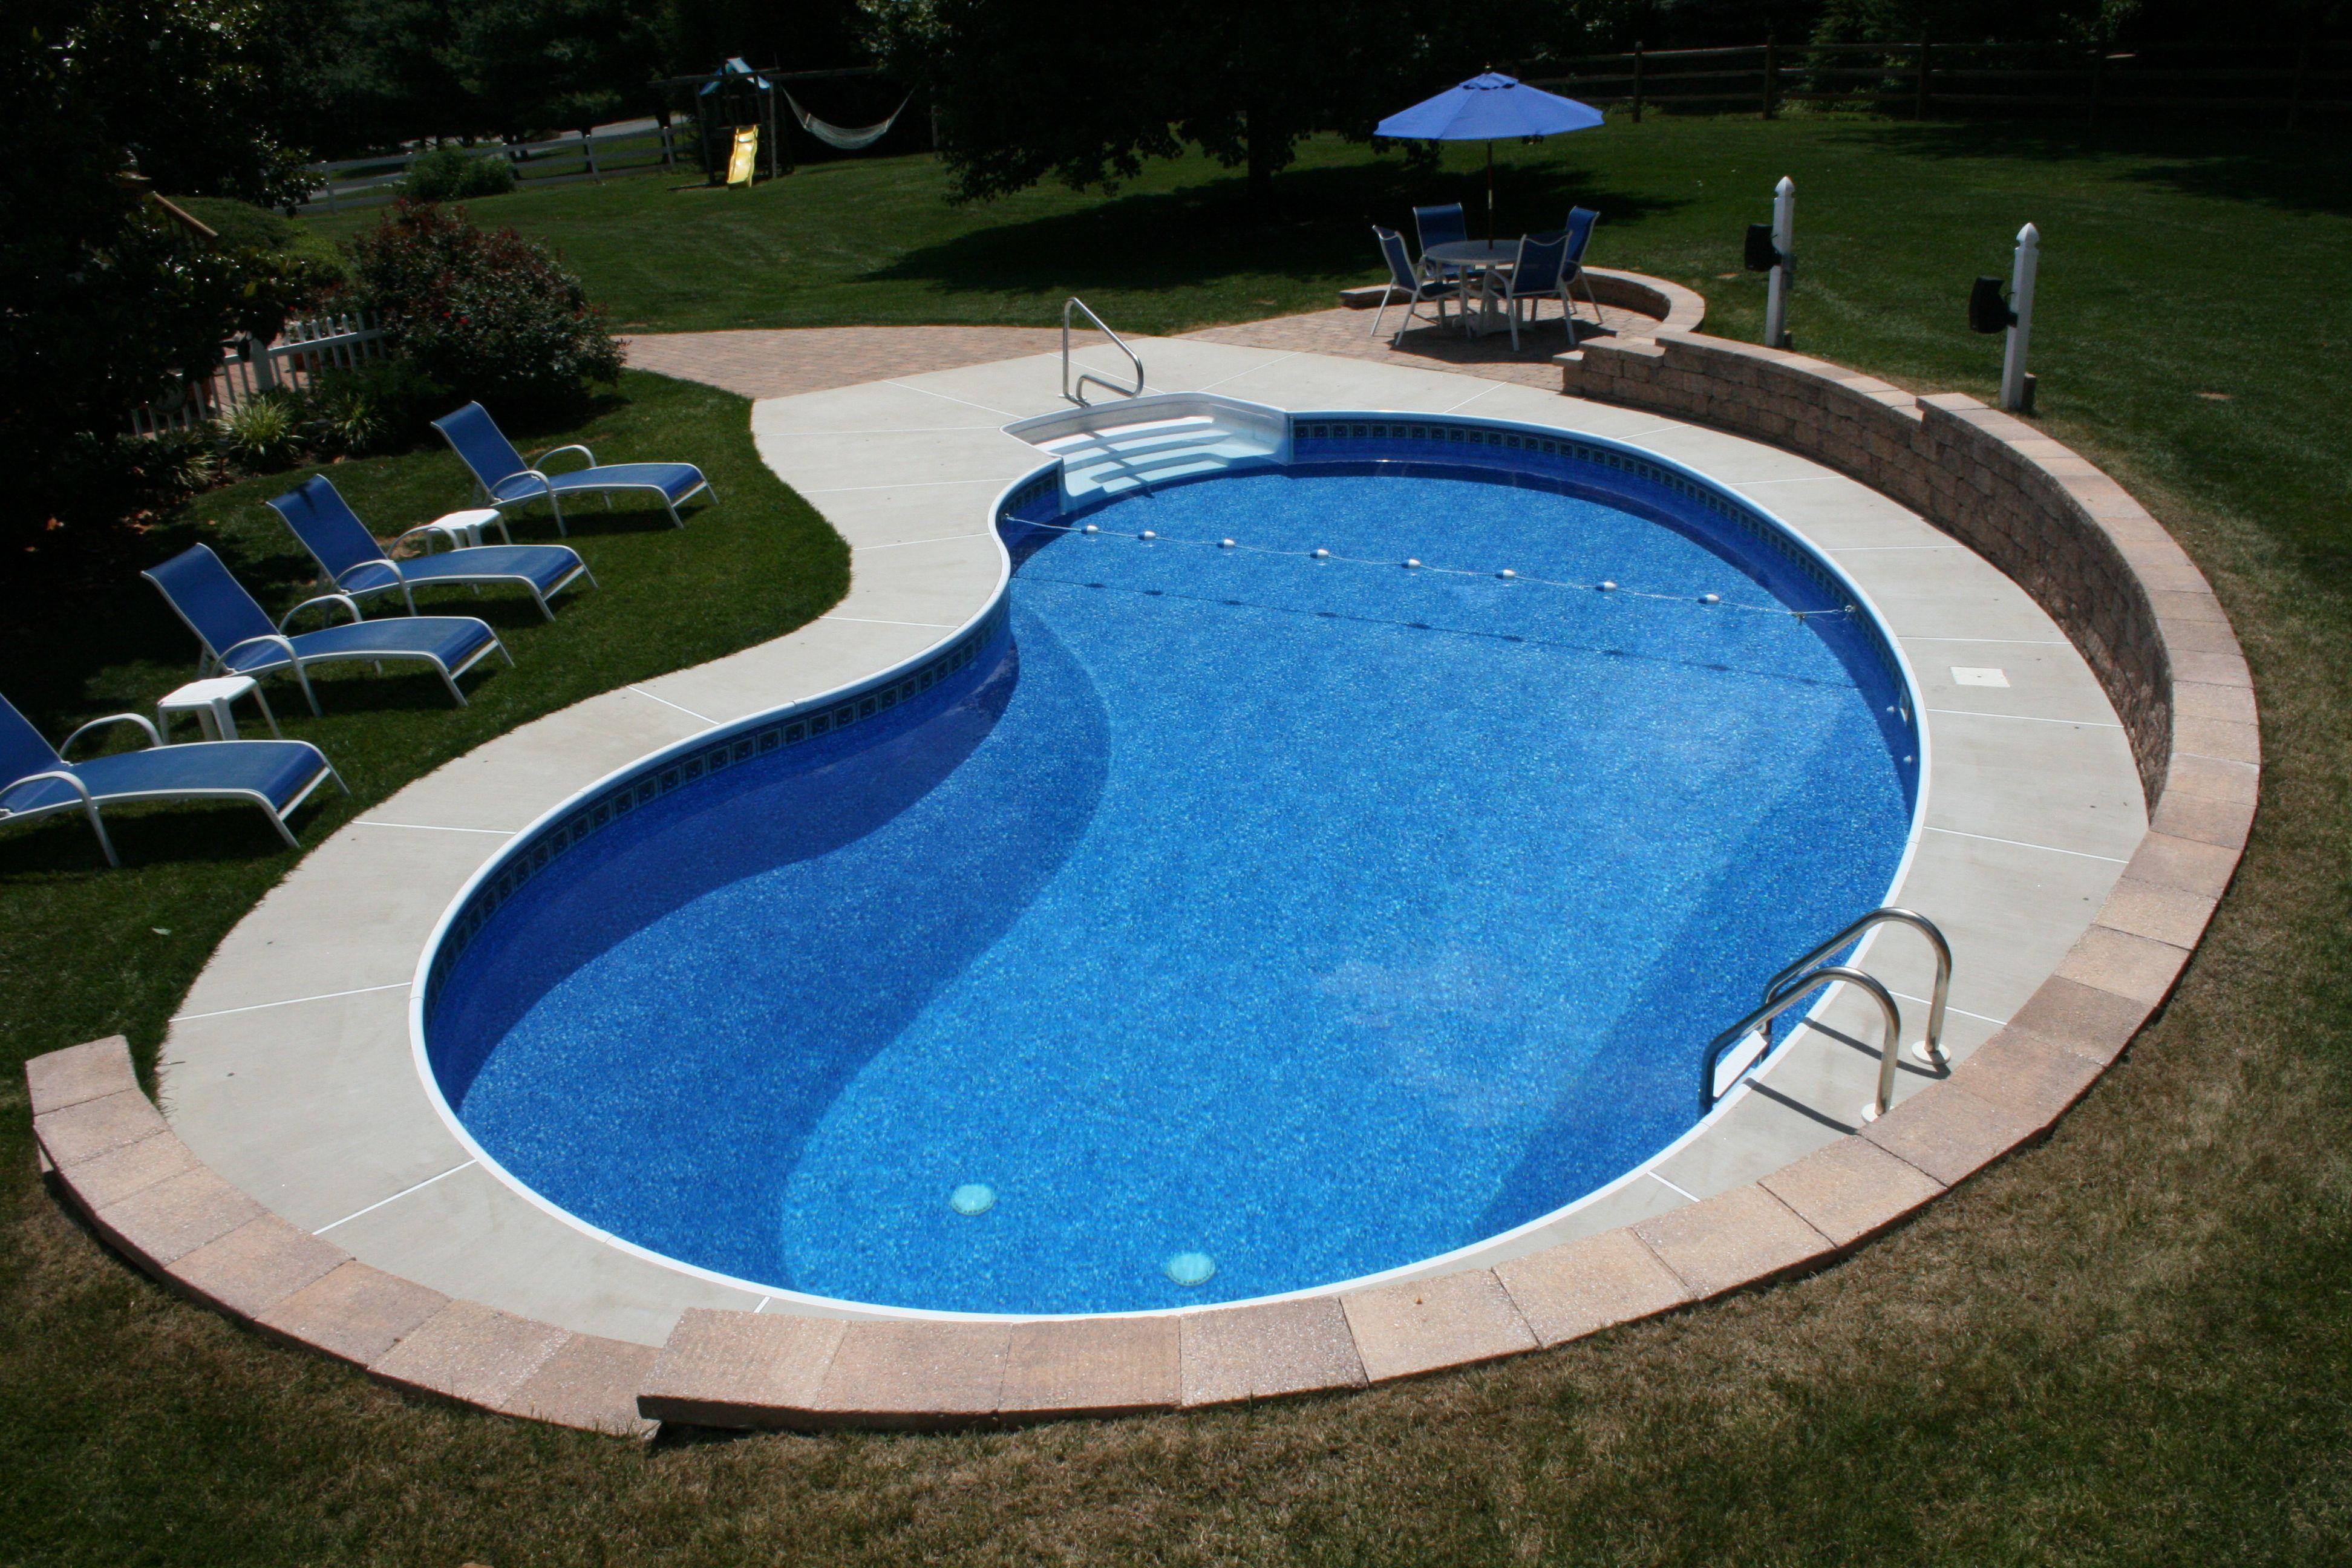 Pin By Regina Pools Spas On Backyard Paradise Kidney Shaped Pool Swimming Pools Backyard Inground Swimming Pools Backyard